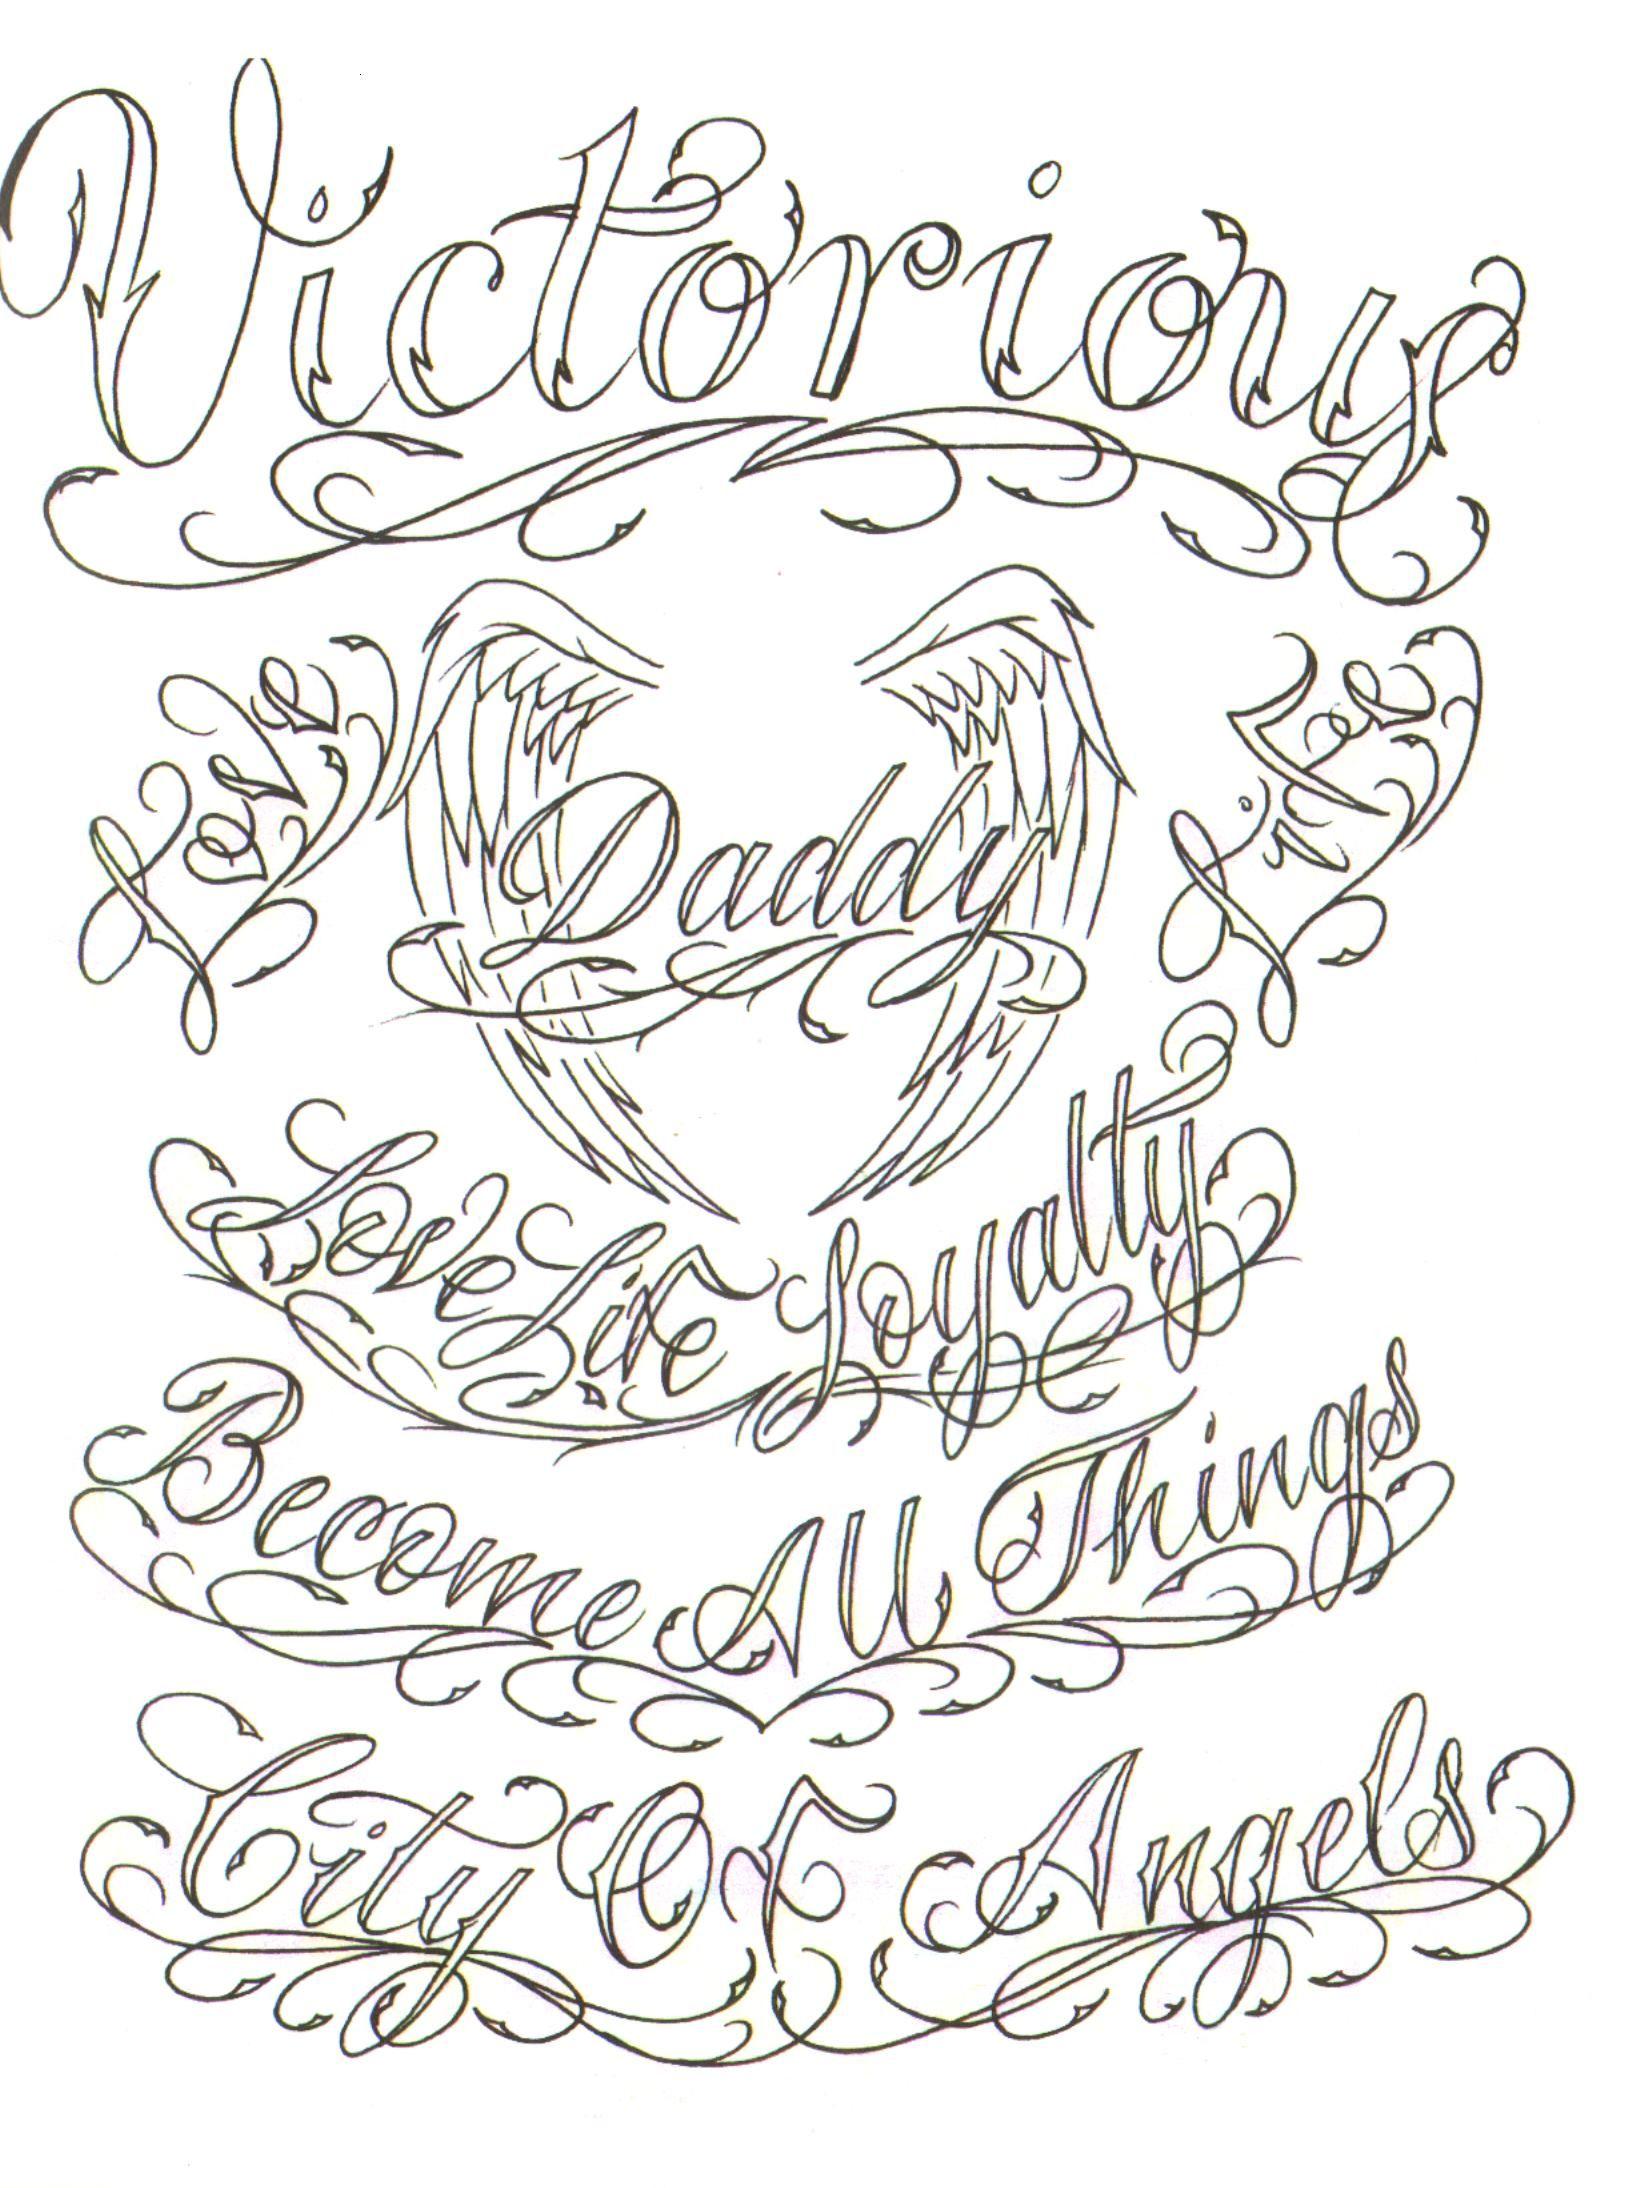 Pin By Susana Delacruz On Calligraphy Fonts